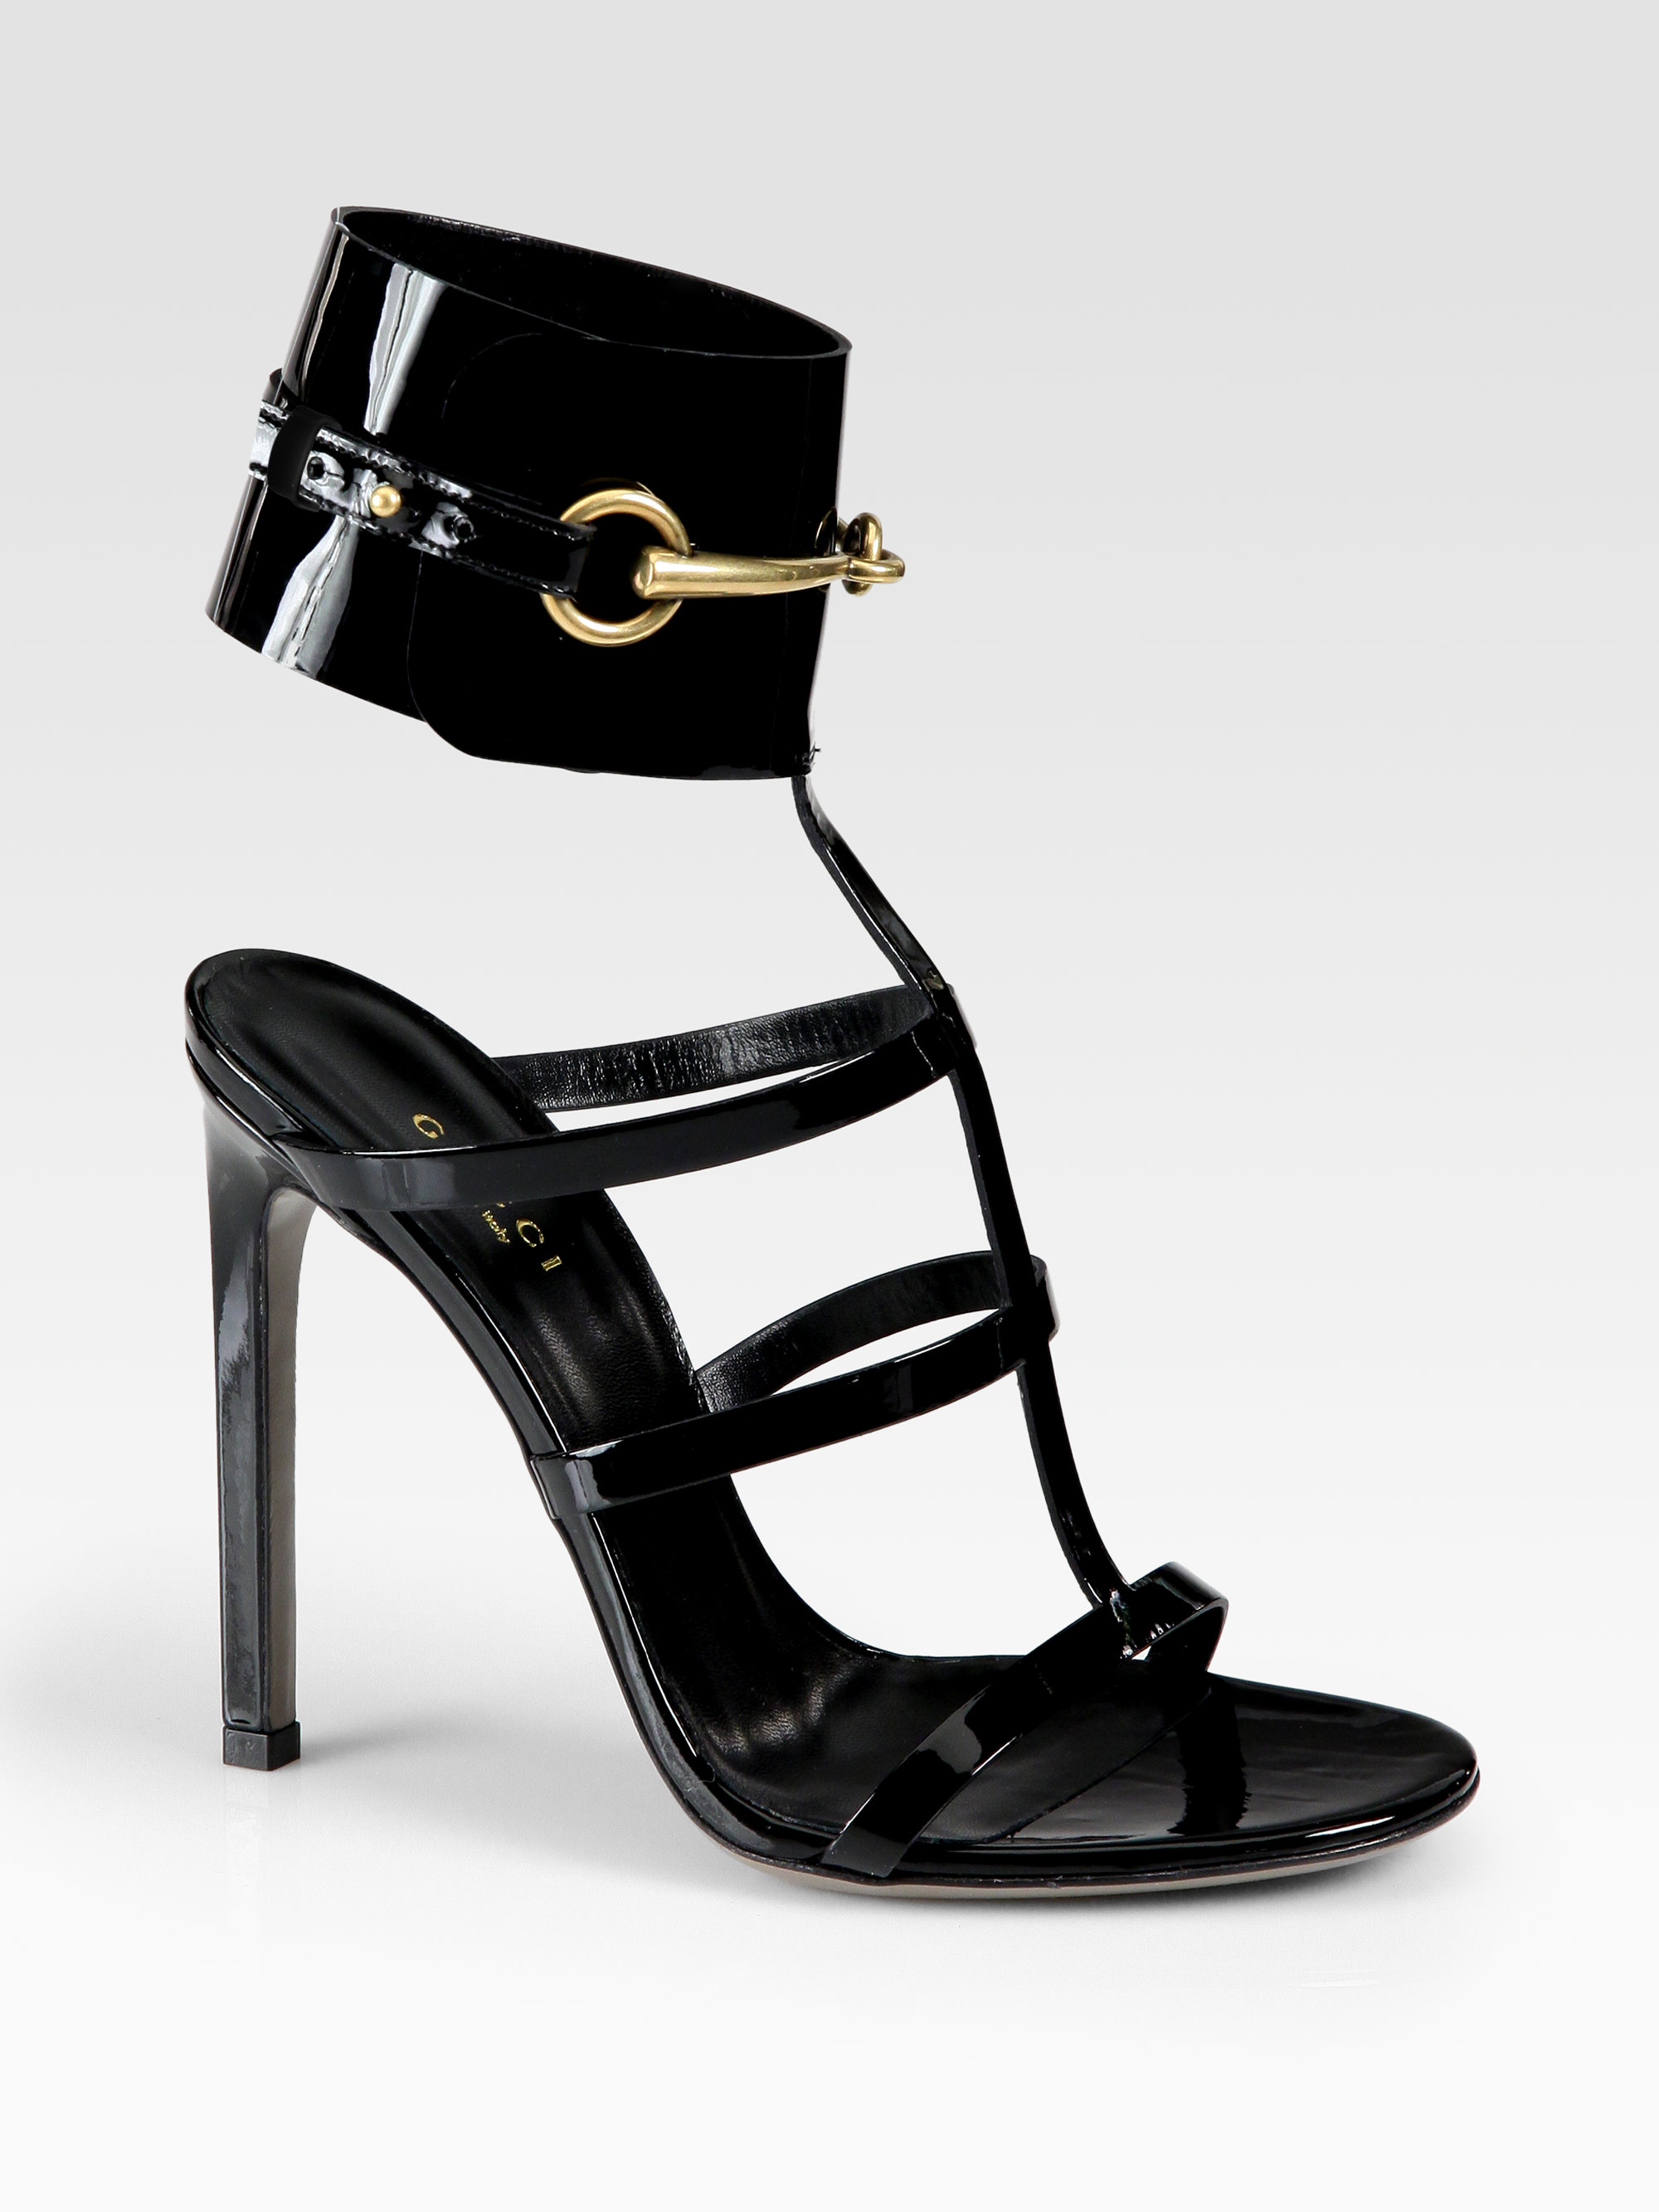 30001d99091 Gucci Ursula Patent Leather Horsebit Ankle Strap Sandals in Black - Lyst